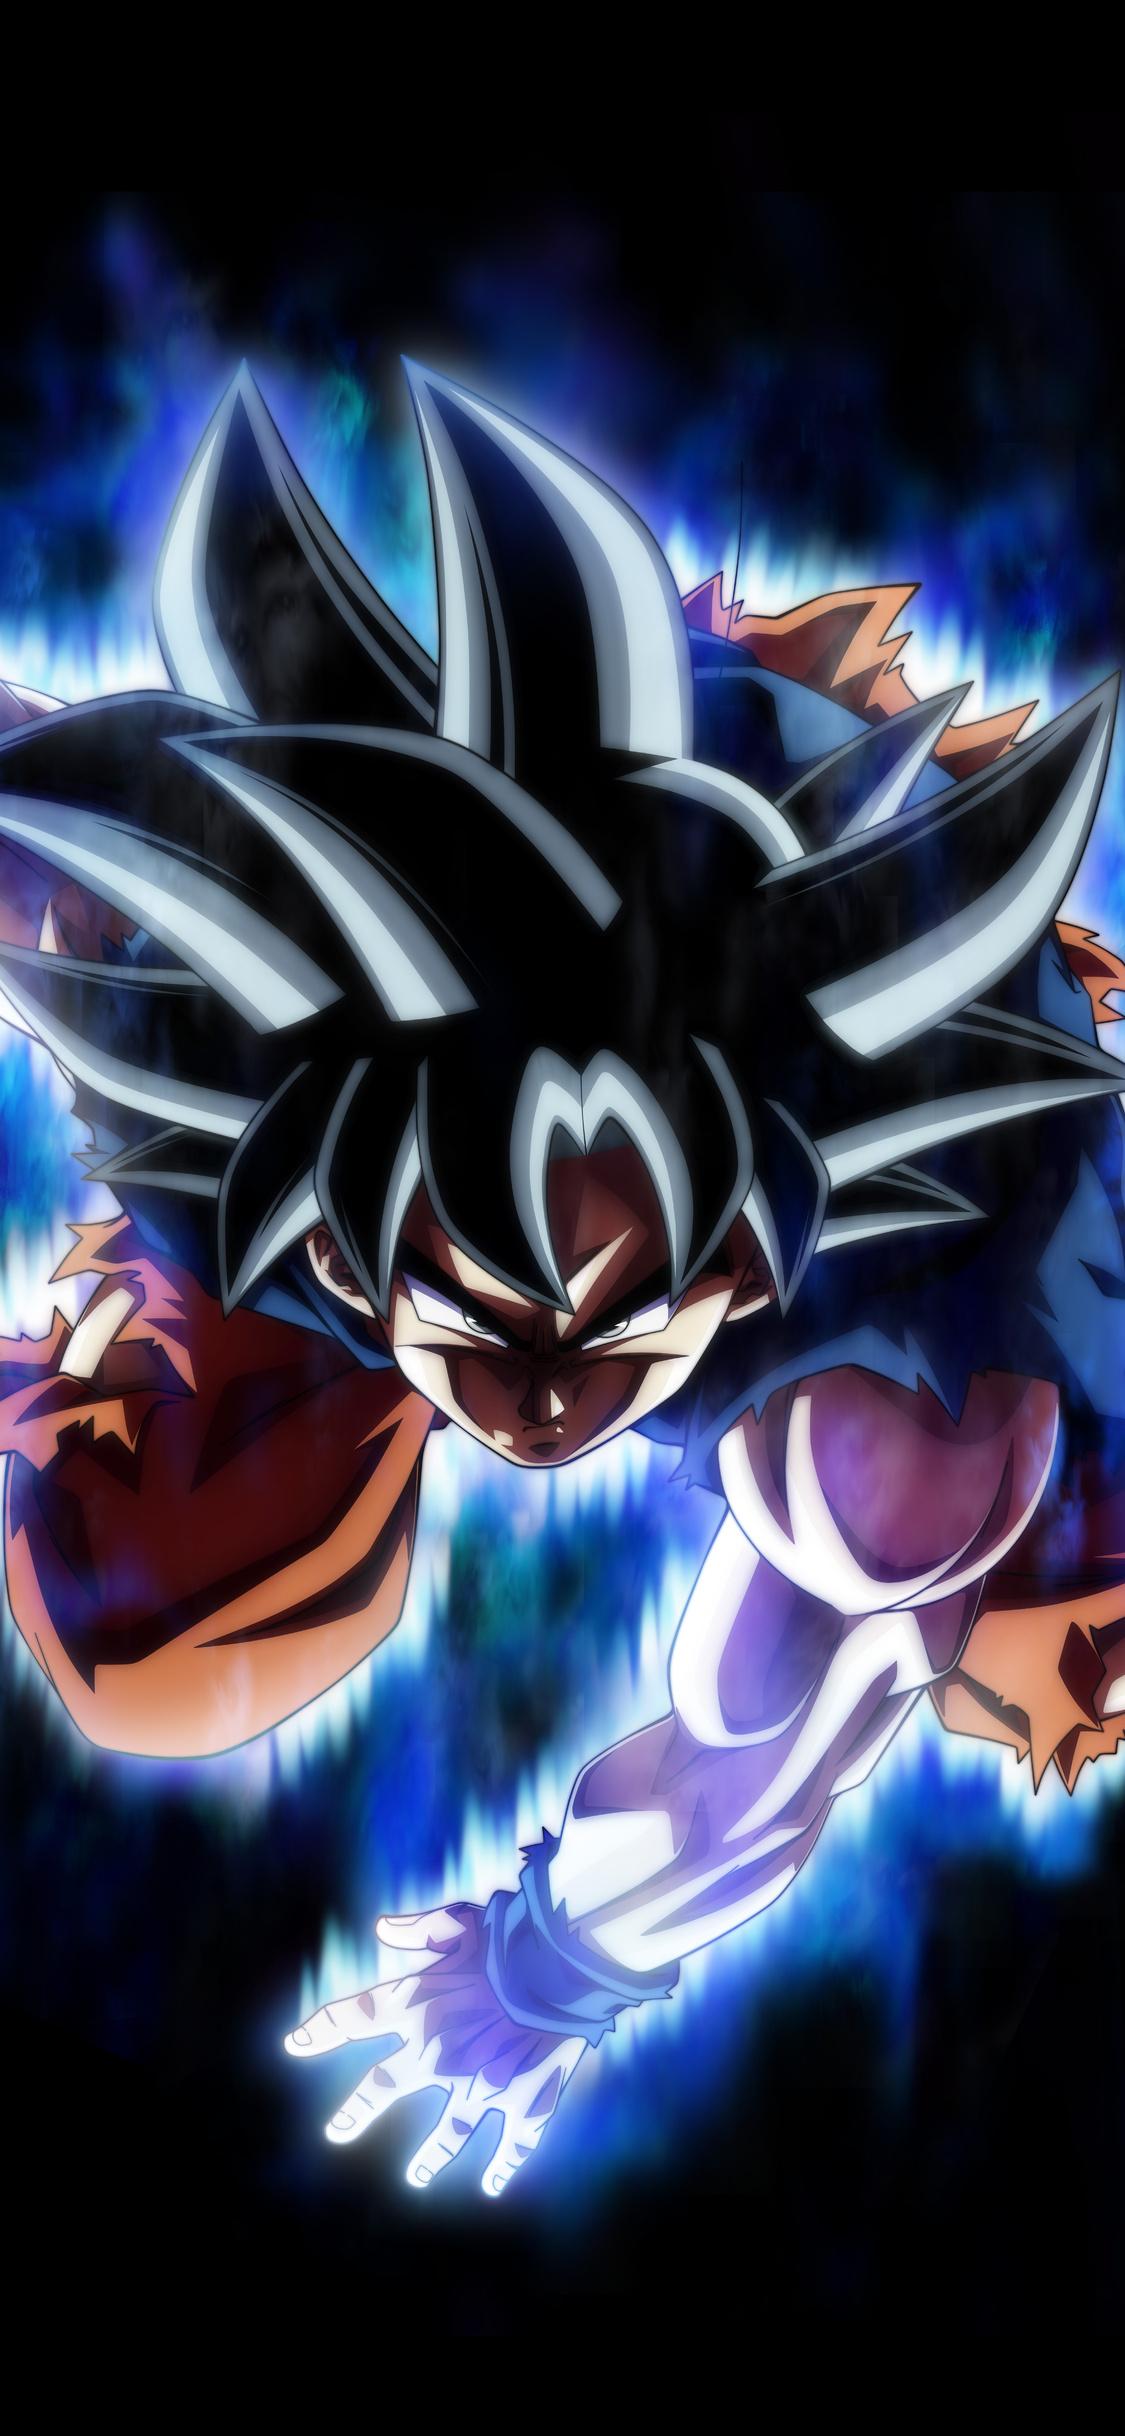 1125x2436 Goku Dragon Ball Super 10k Iphone XS,Iphone 10,Iphone X HD 4k Wallpapers, Images